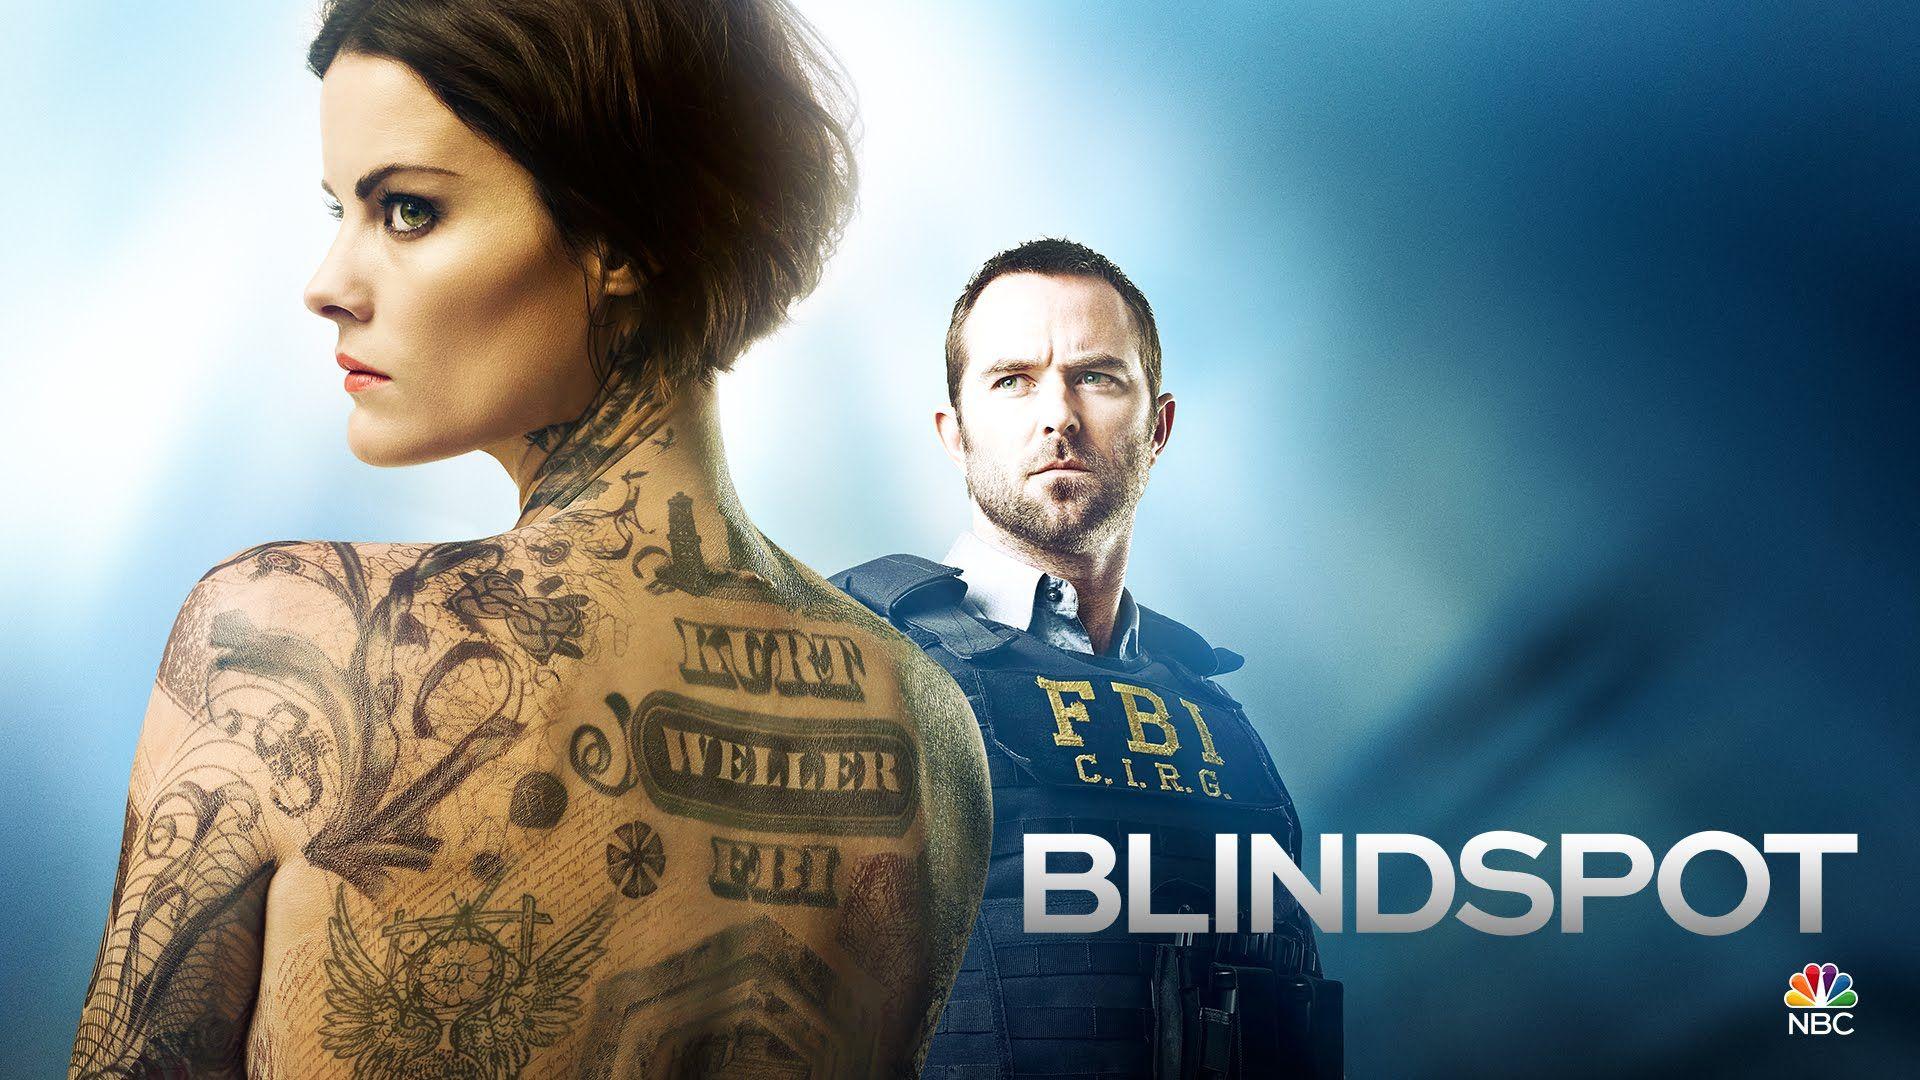 Download Blindspot Complete Season 1 Download | Around the Internet ...